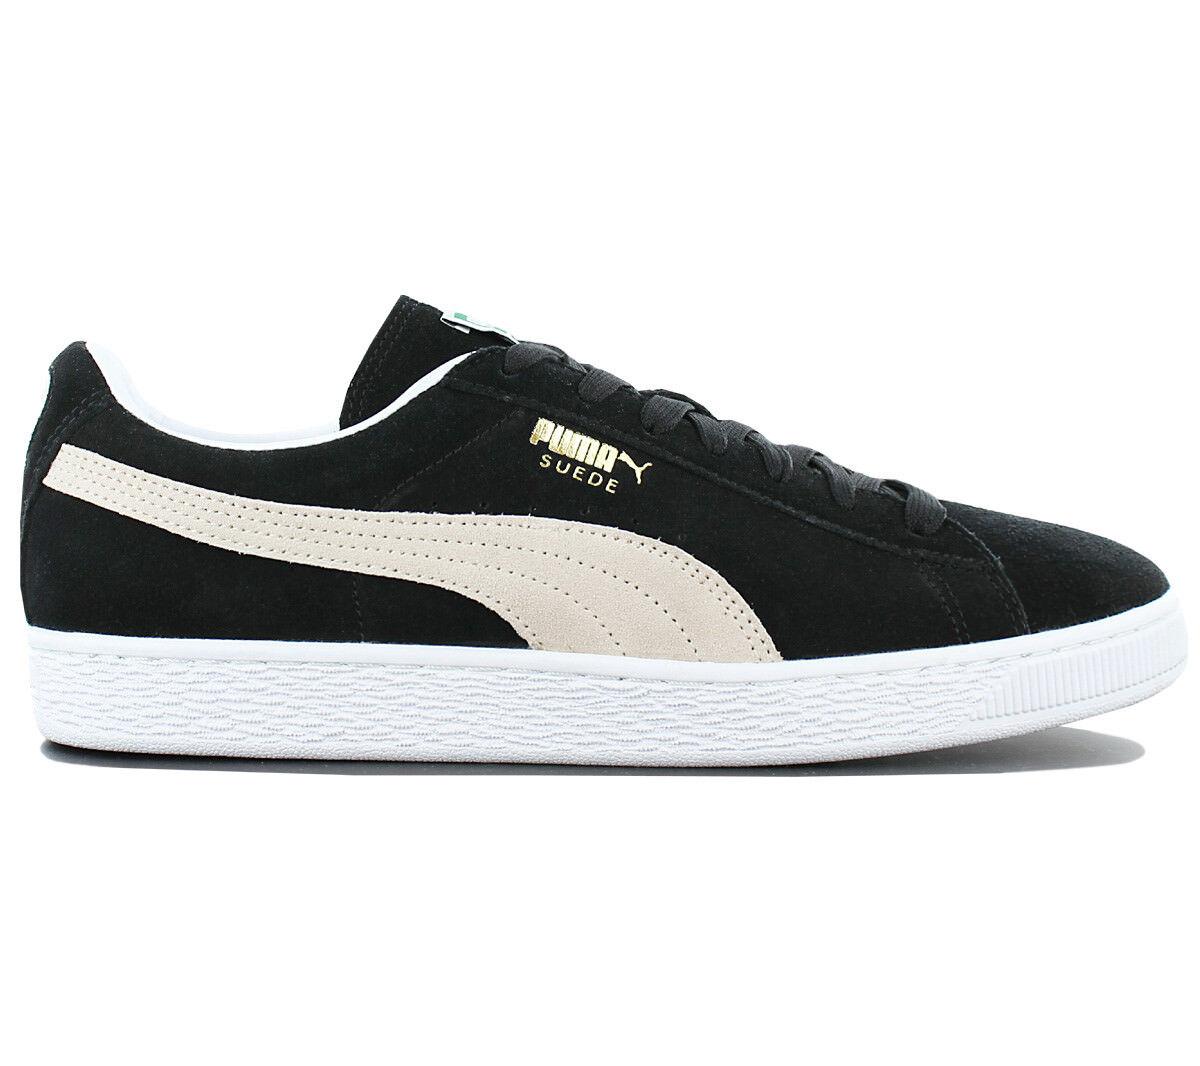 Puma Suede Classic Herren Schuhe Sneaker Schwarz Wildleder Turnschuhe 352634-03